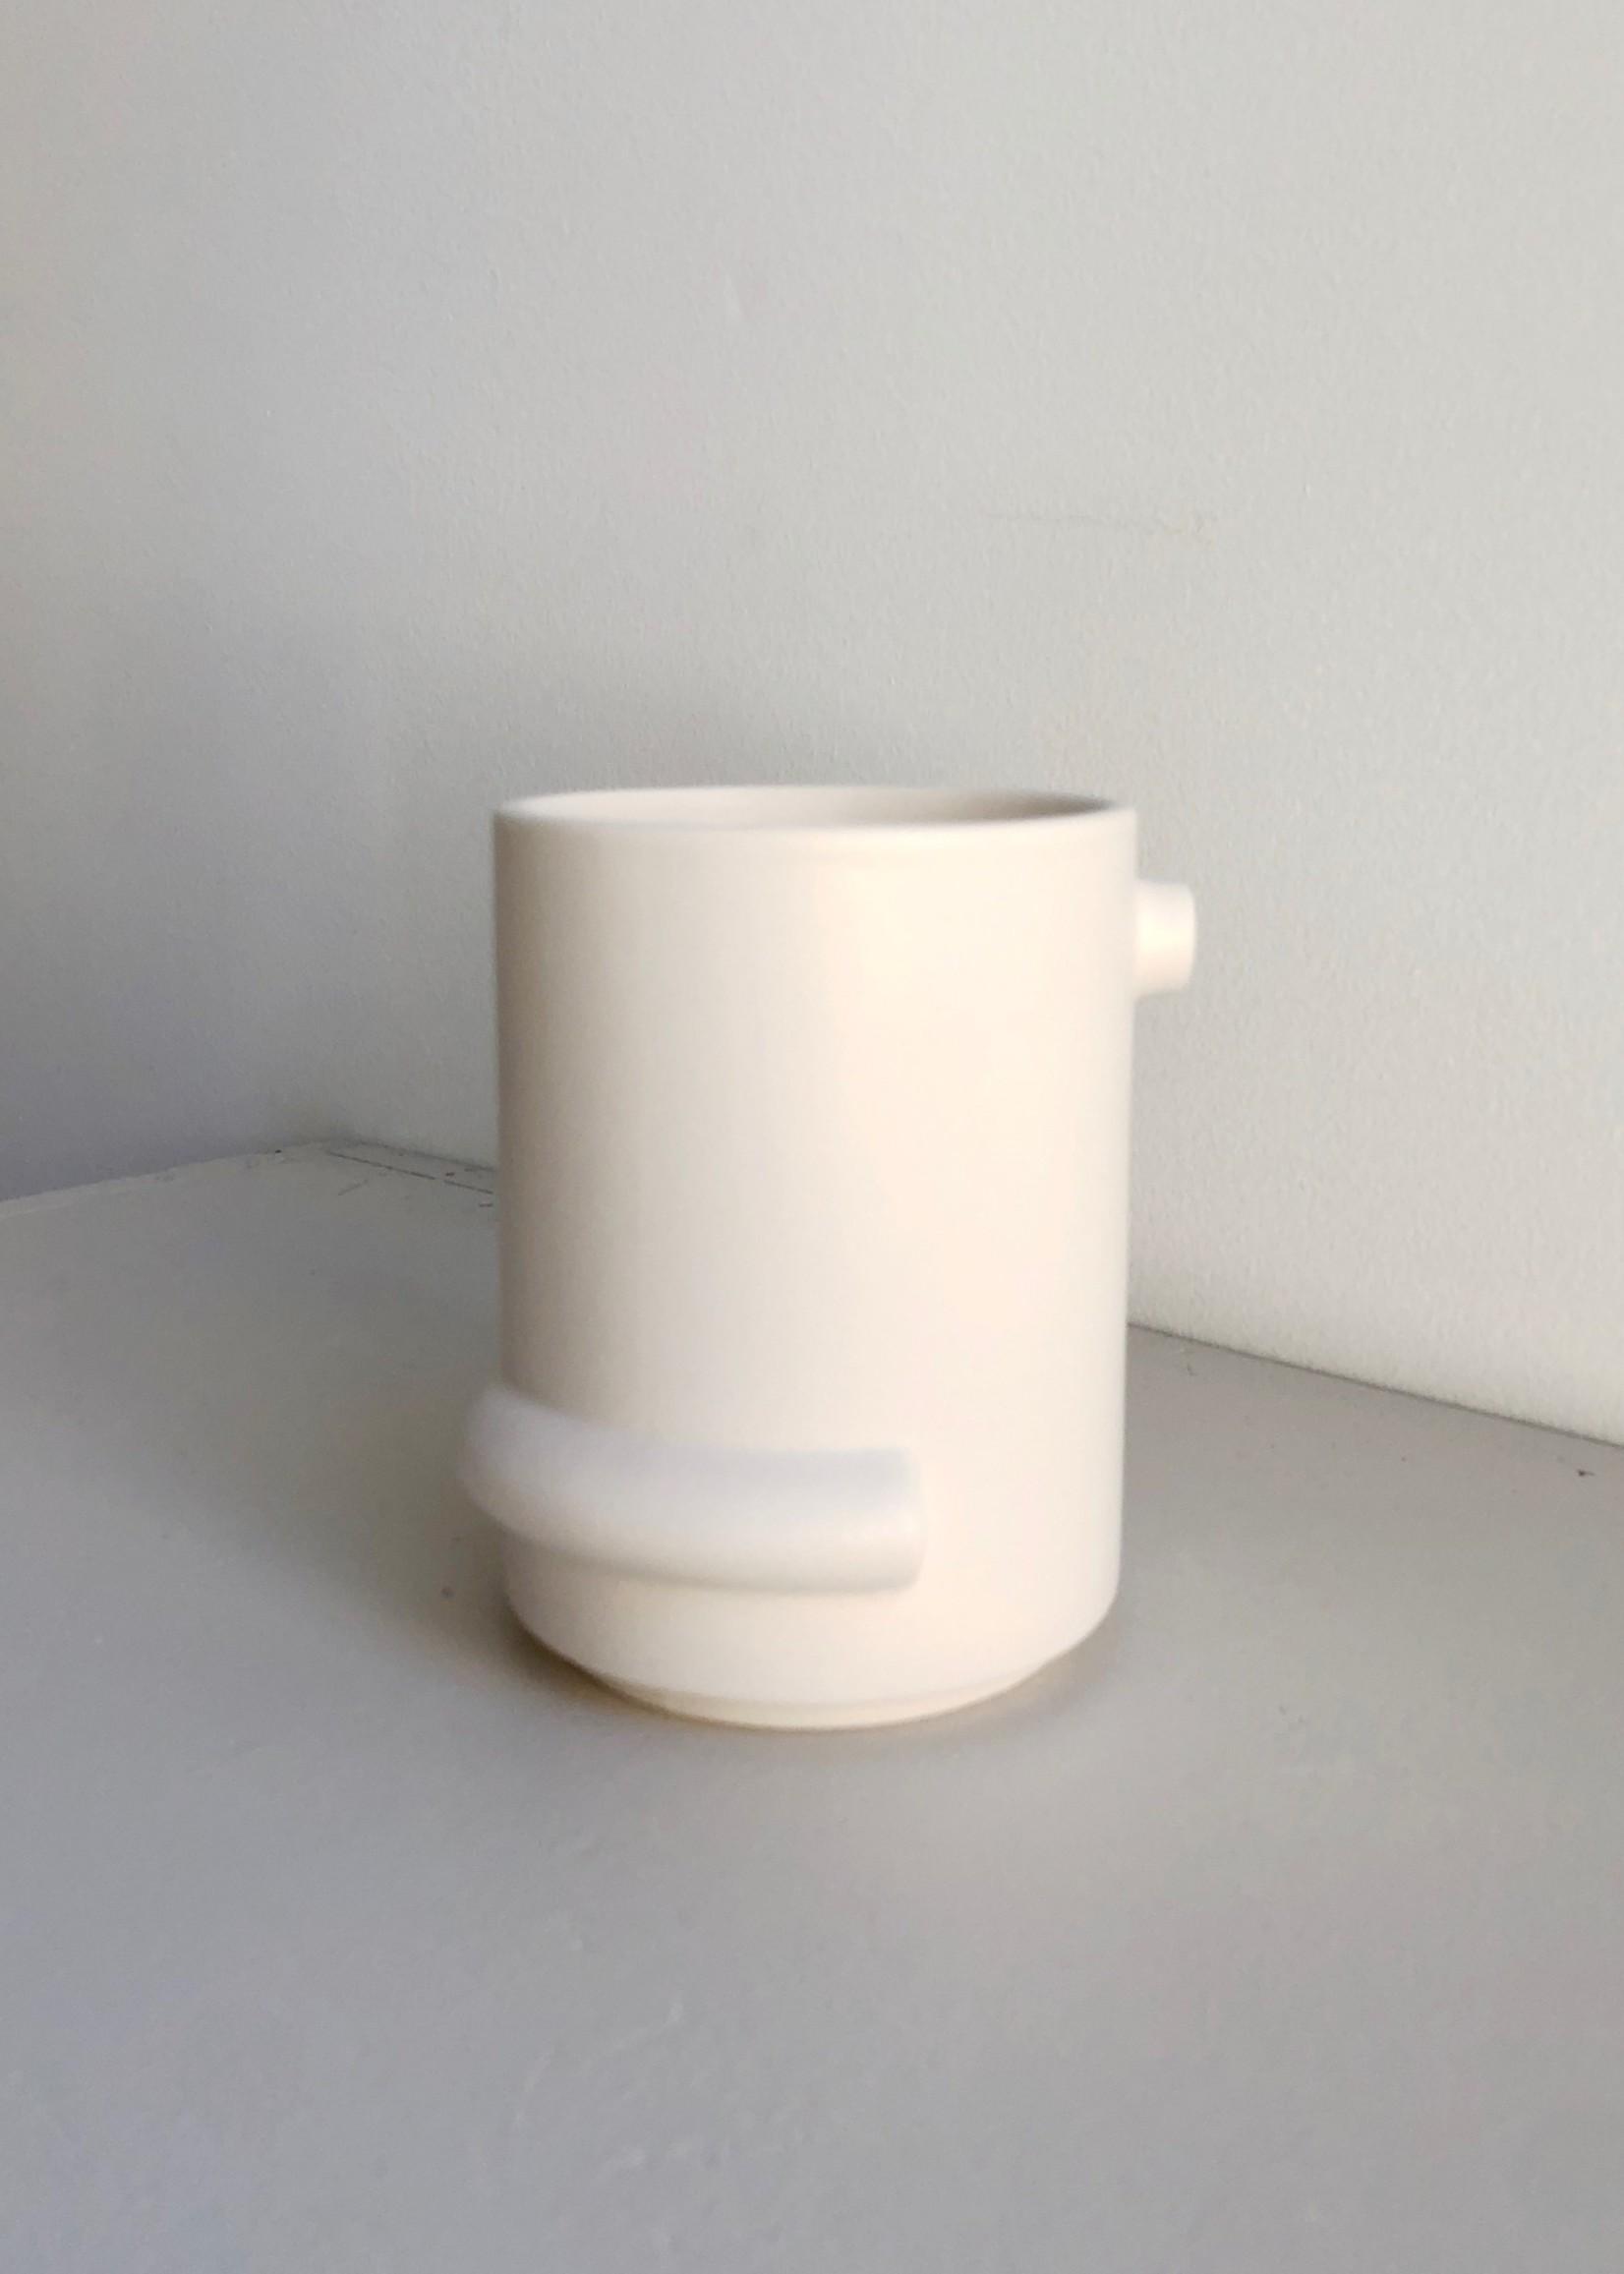 Areaware Ceramic Confetti Cups by Areaware